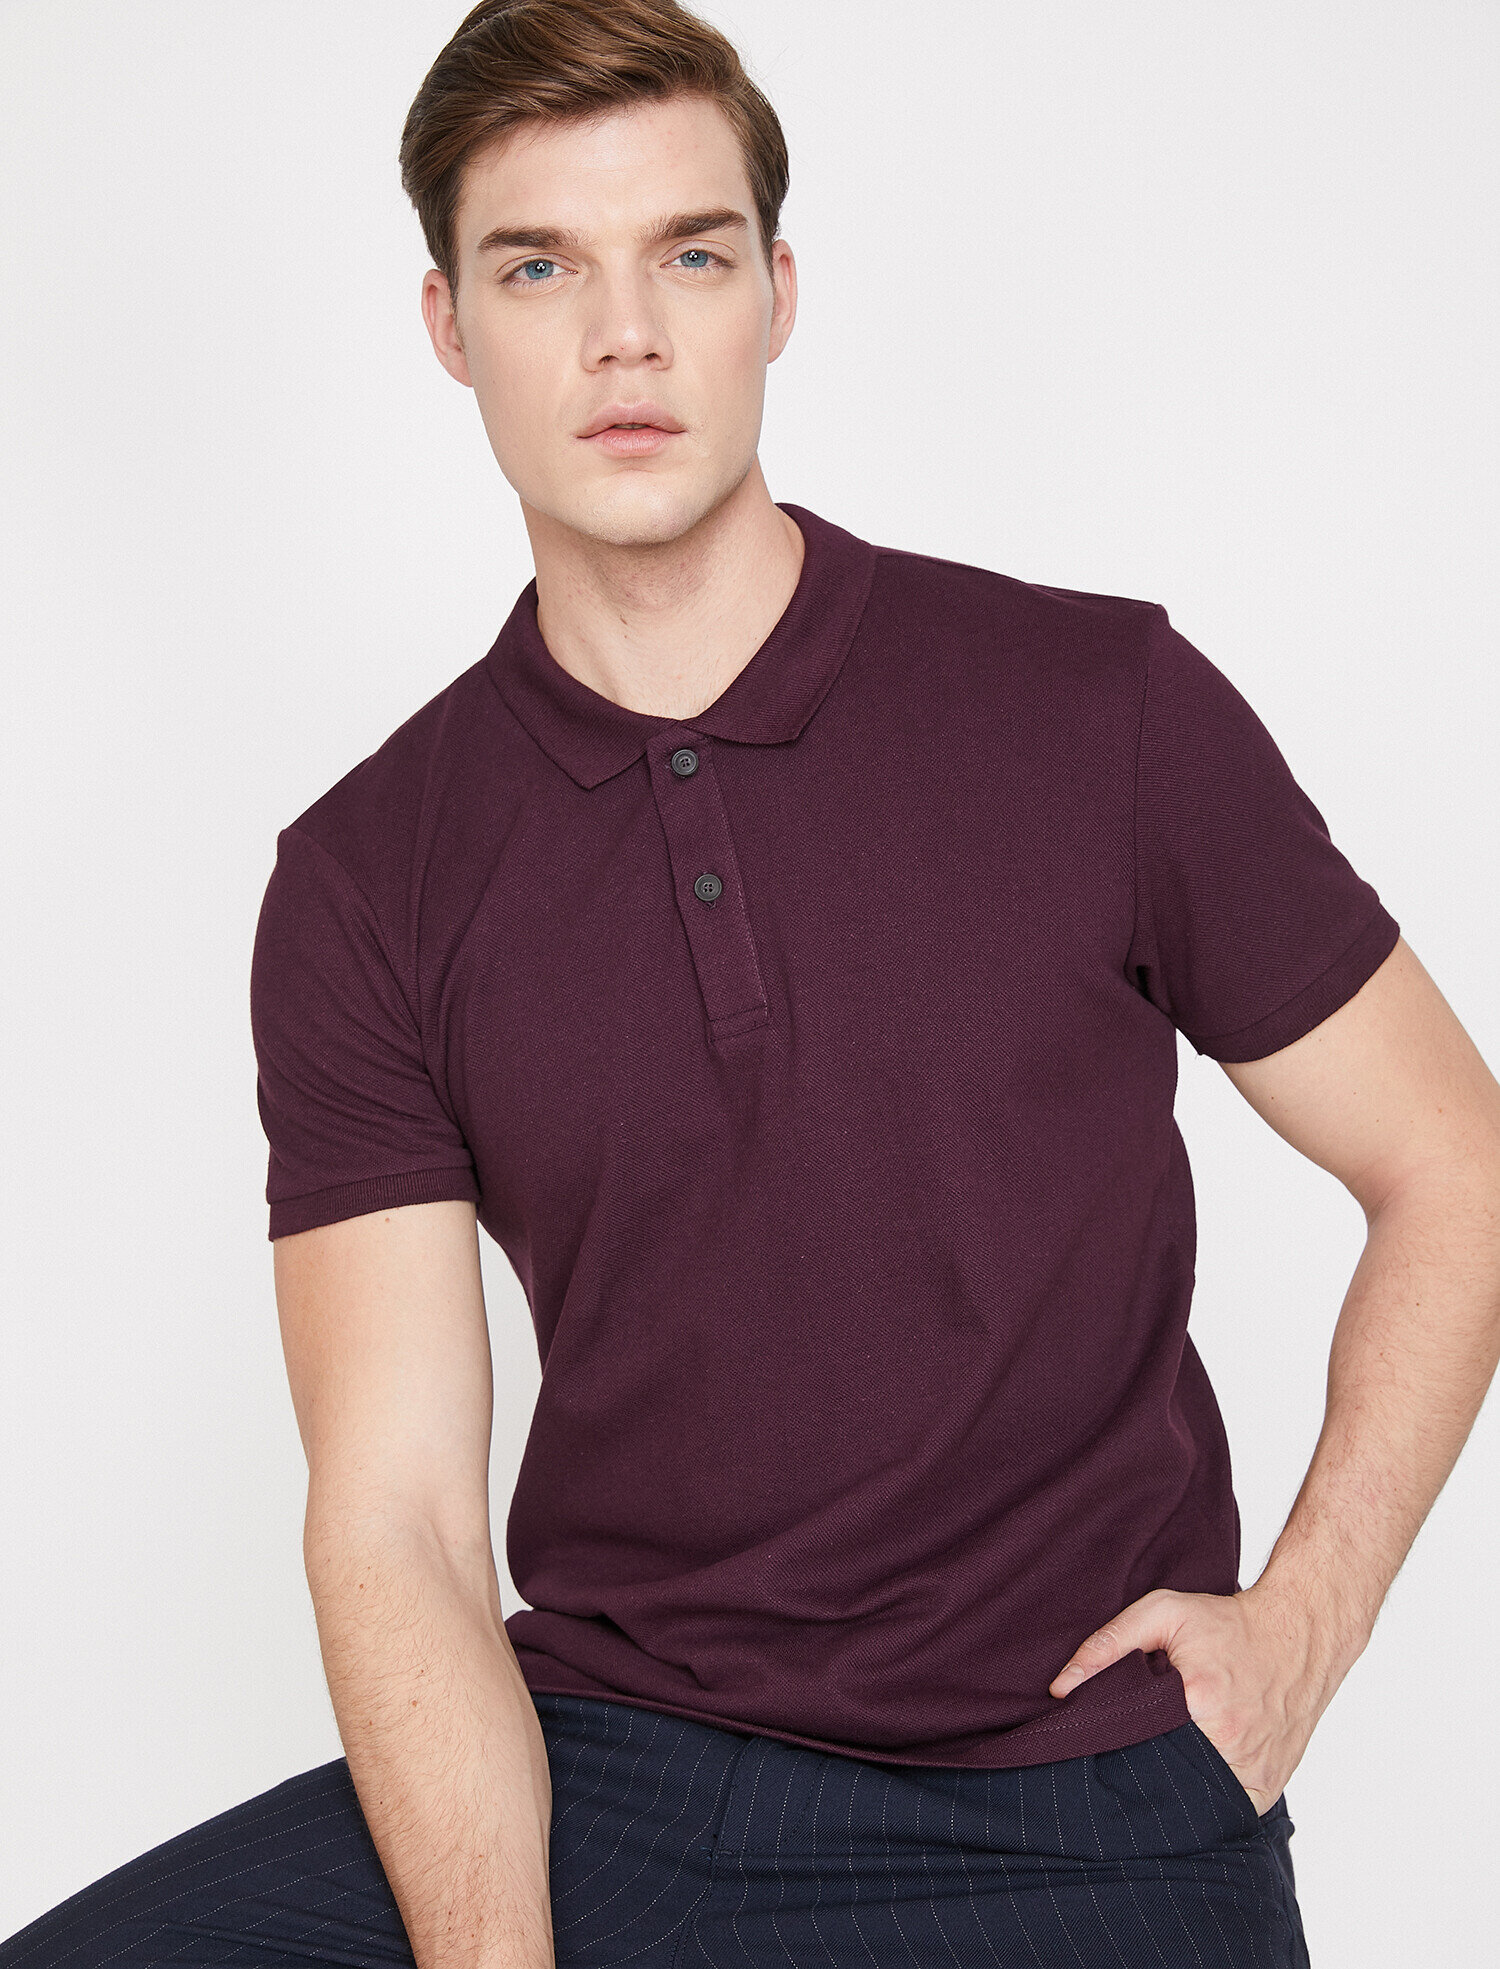 Koton Erkek Polo Yaka T-Shirt Mor Ürün Resmi